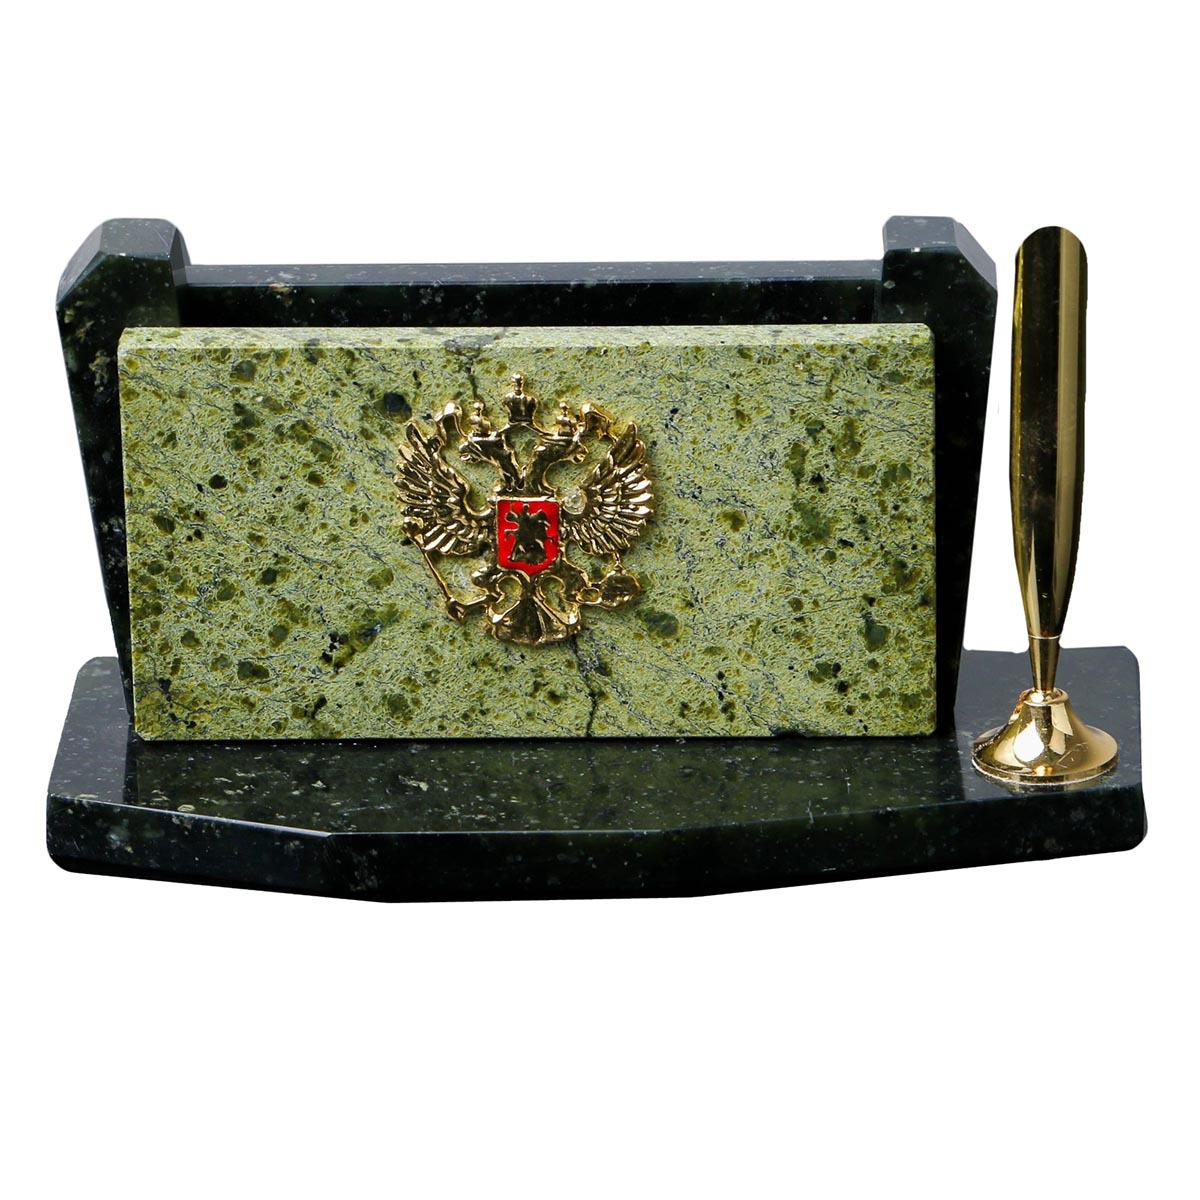 Канцелярский набор Офис с гербом, 423894, зеленый, 17 х 7 х 8 см